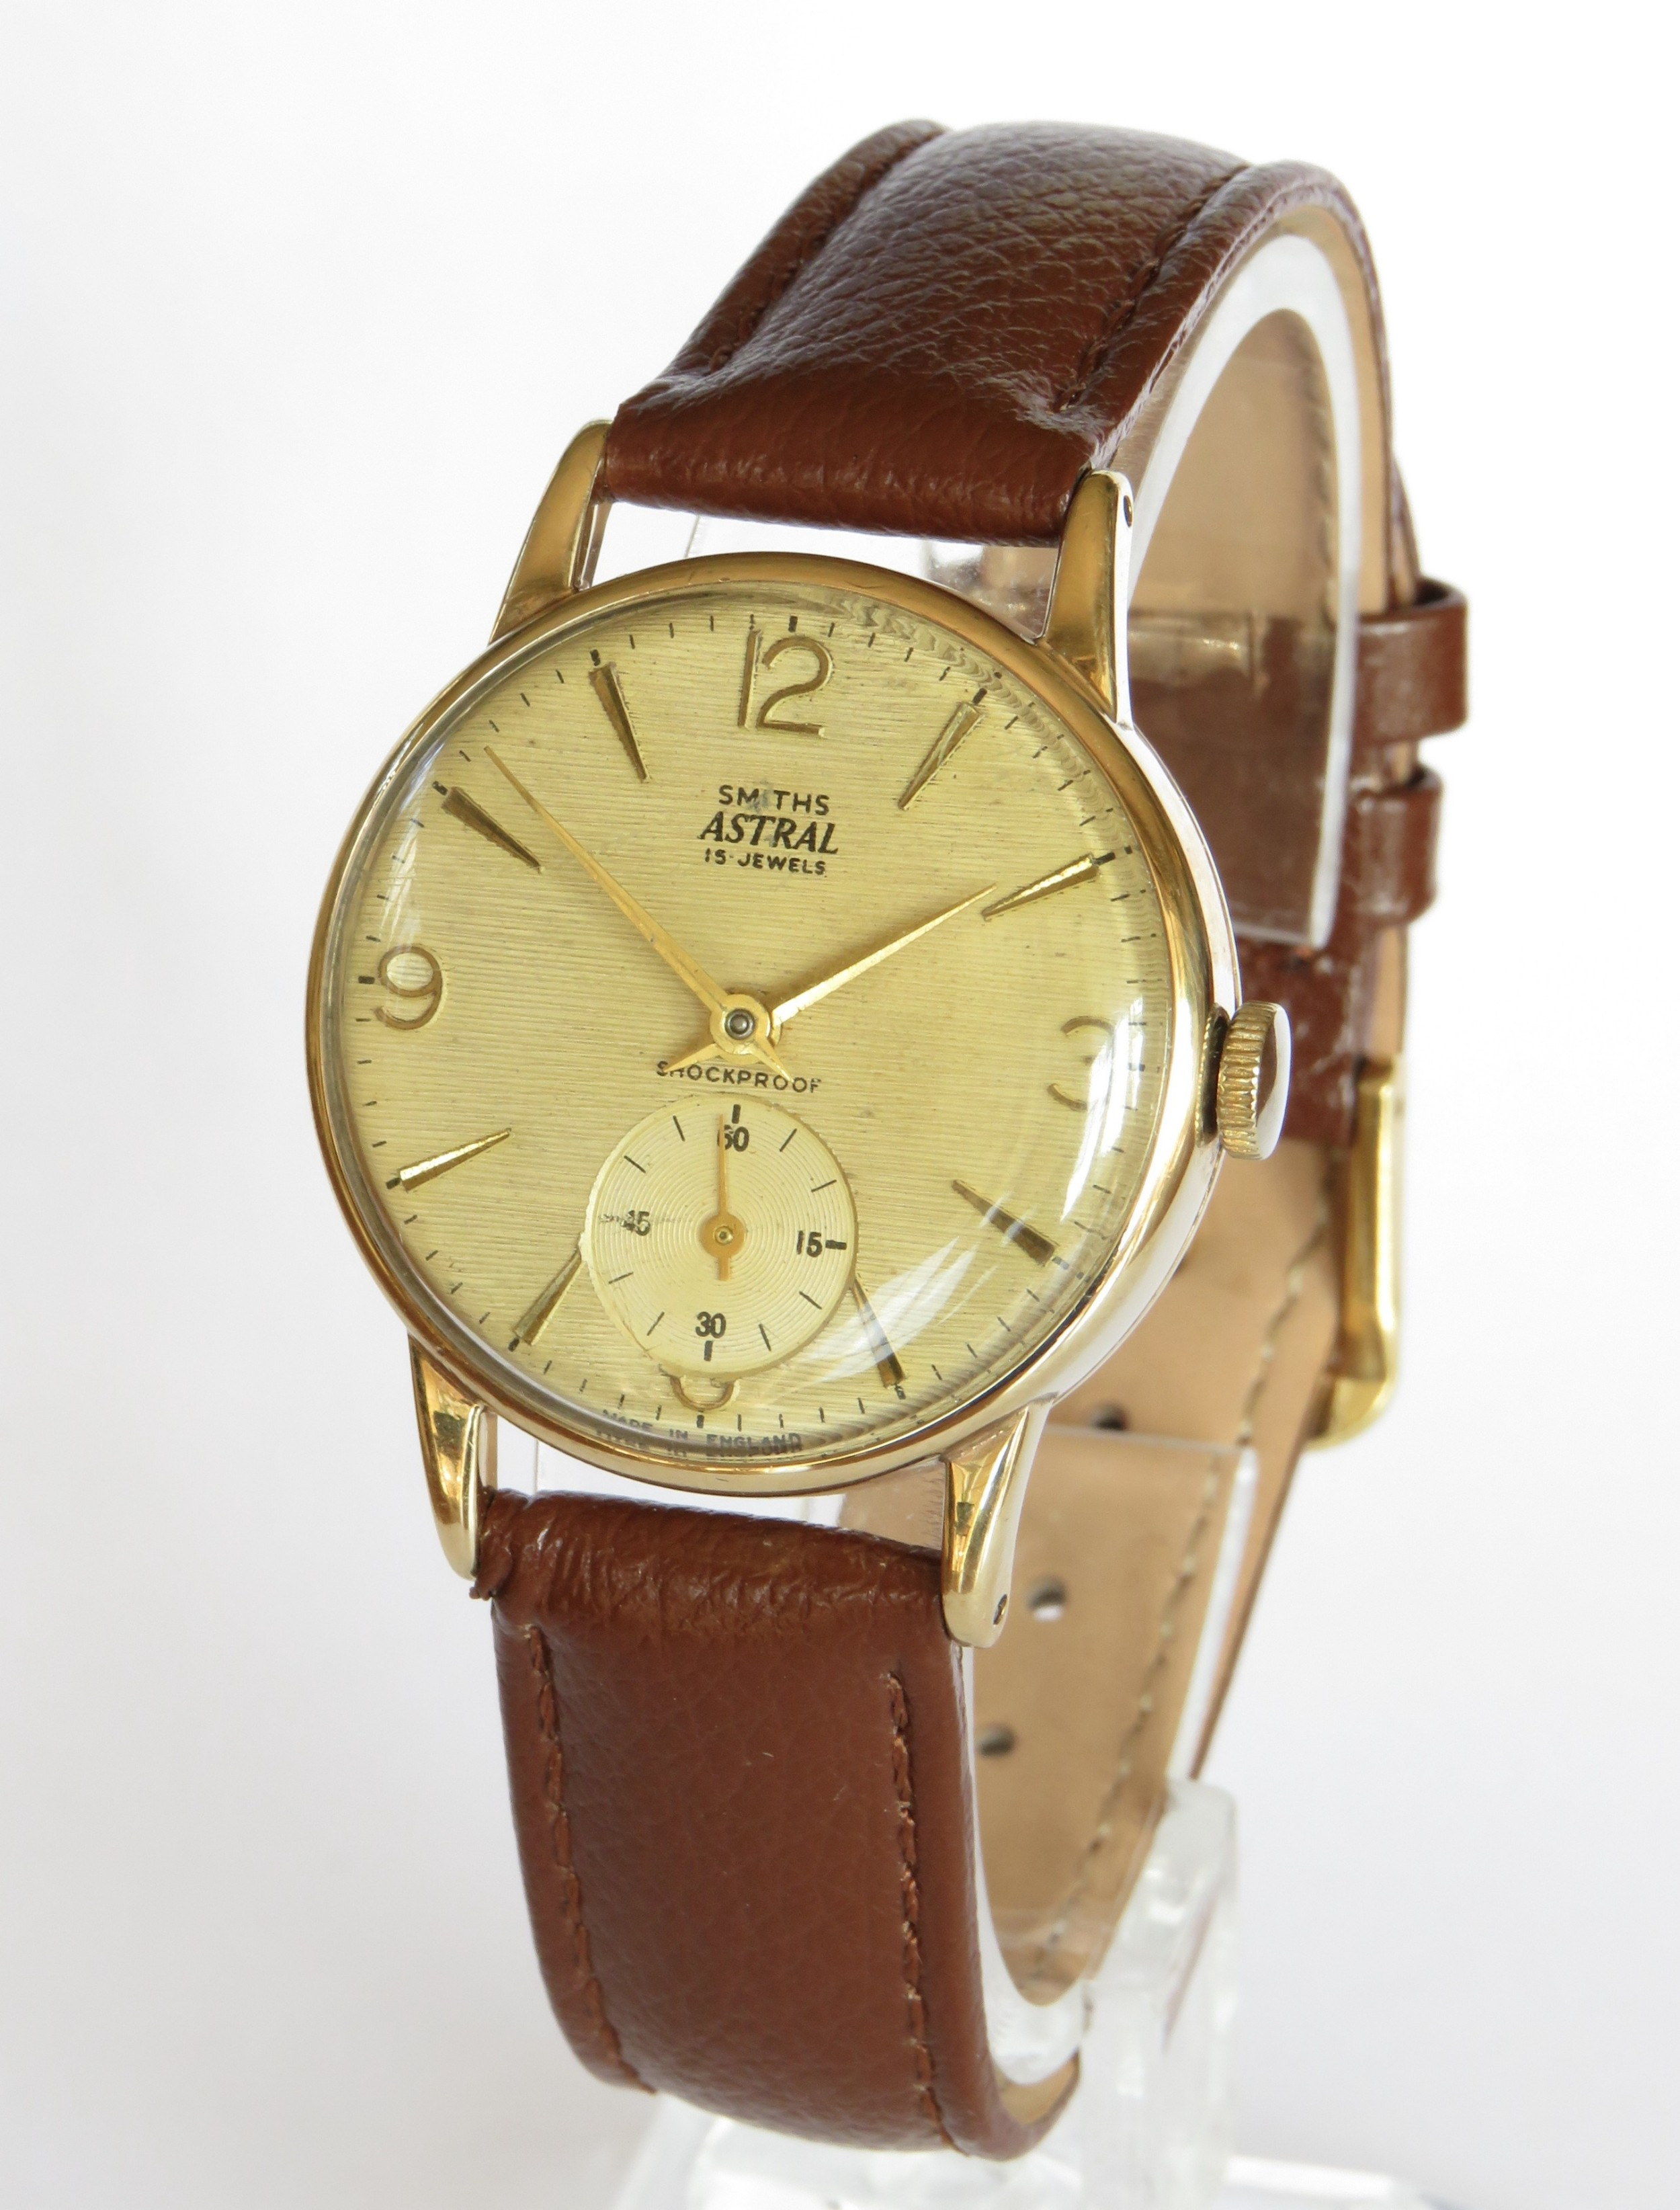 gents 9ct gold smiths astral wrist watch 1961